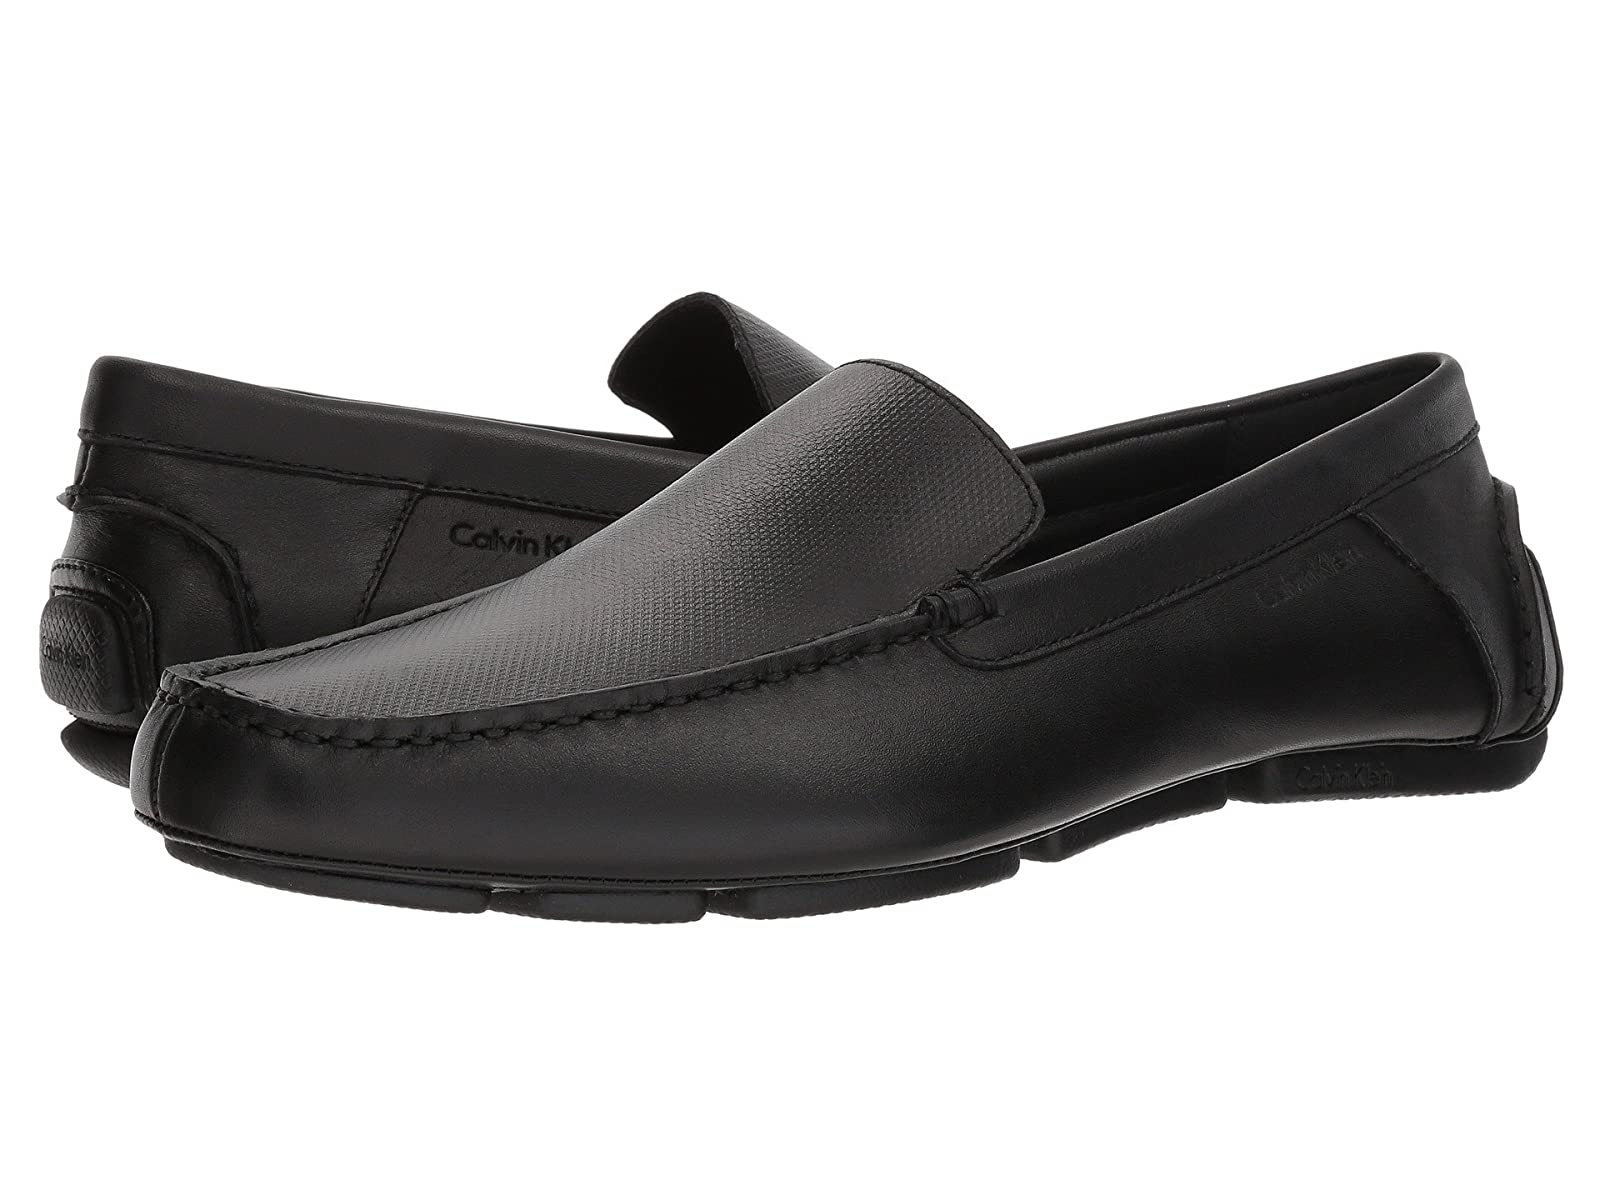 Calvin Klein MiguelAtmospheric grades have affordable shoes